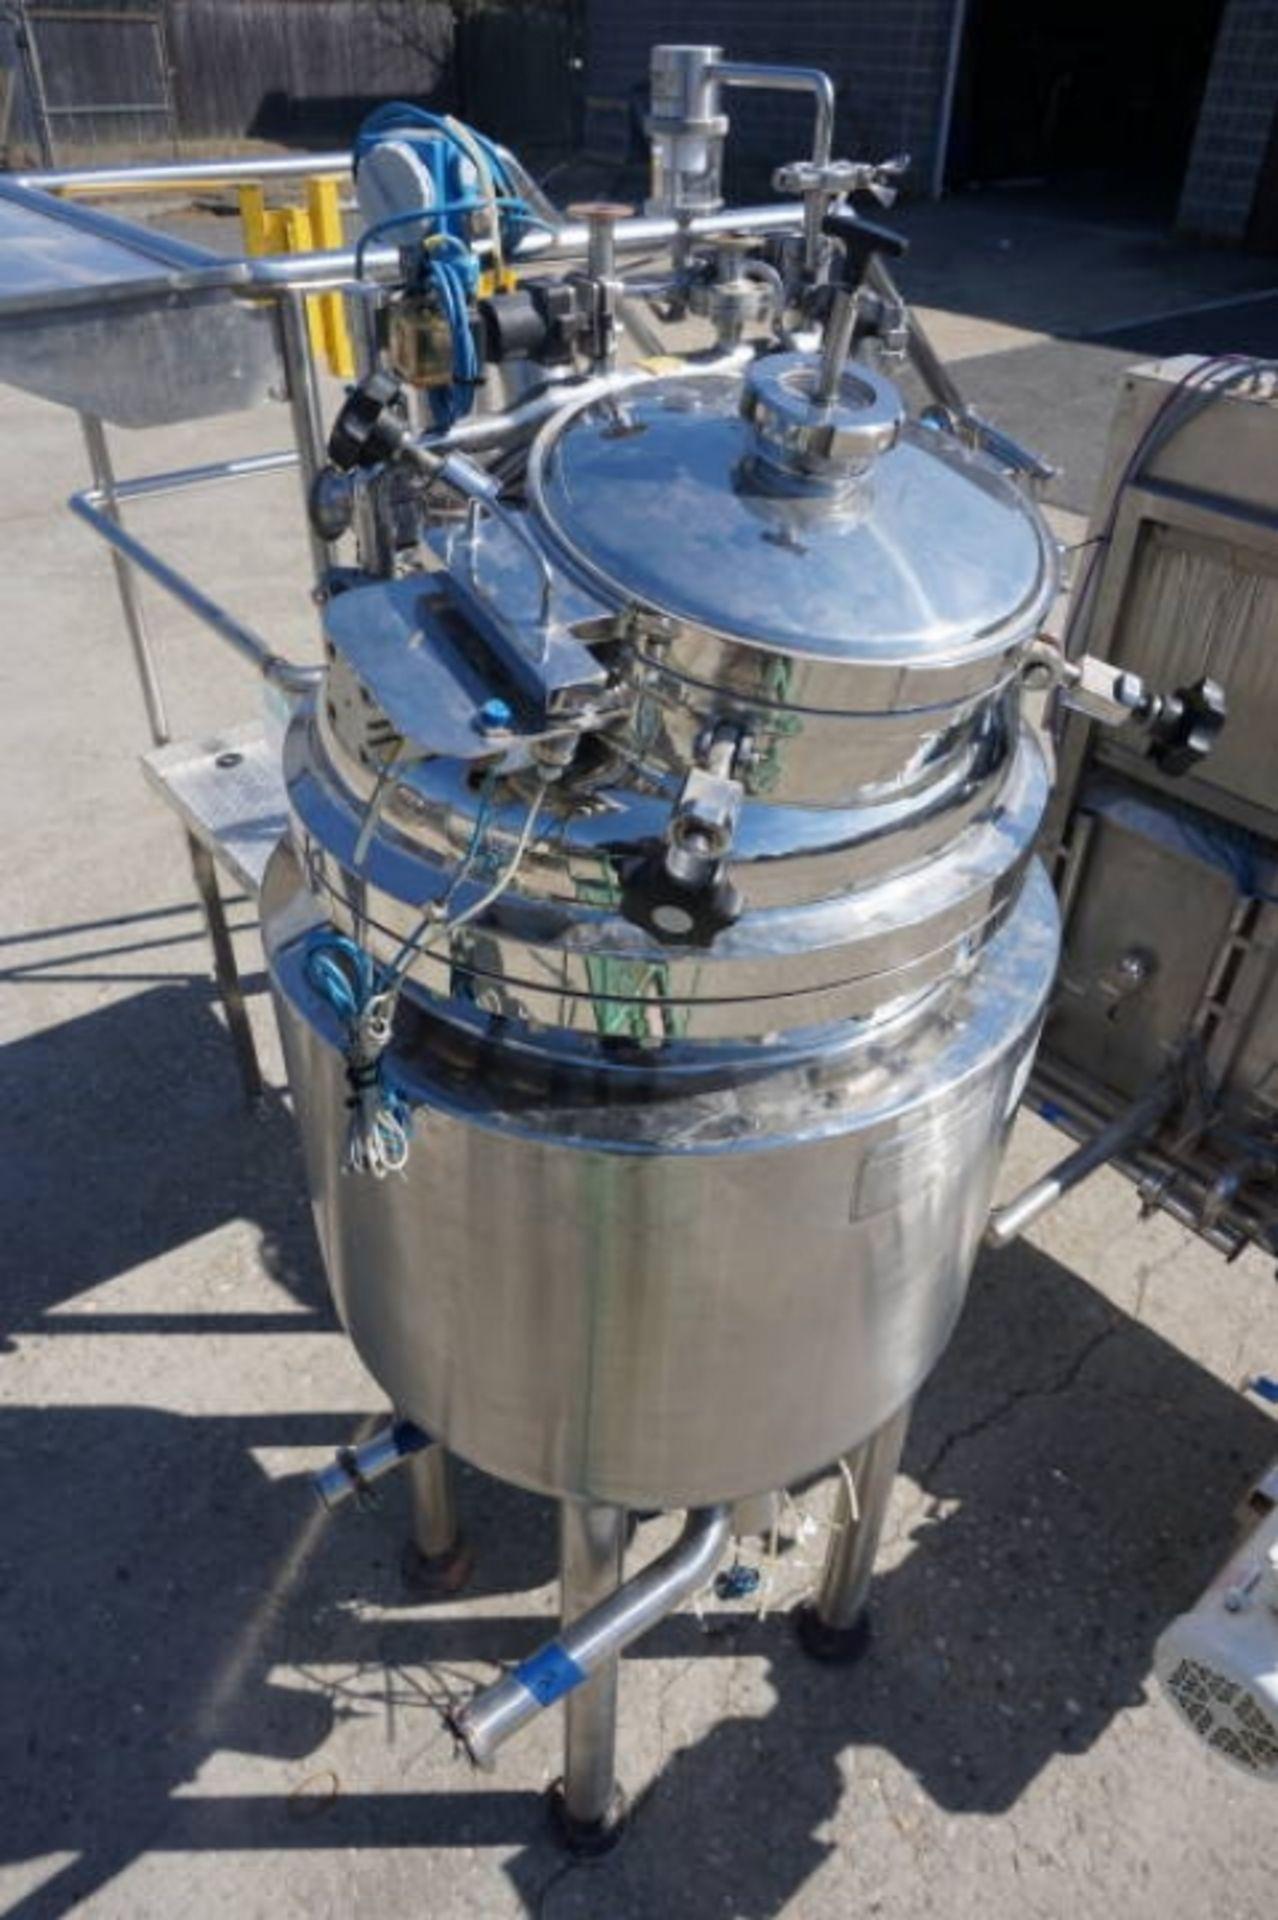 Lot 3 - Krieger approx. 125 Liter Stainless Steel Jacketed Pressure Vessel, S/N 0503-9394